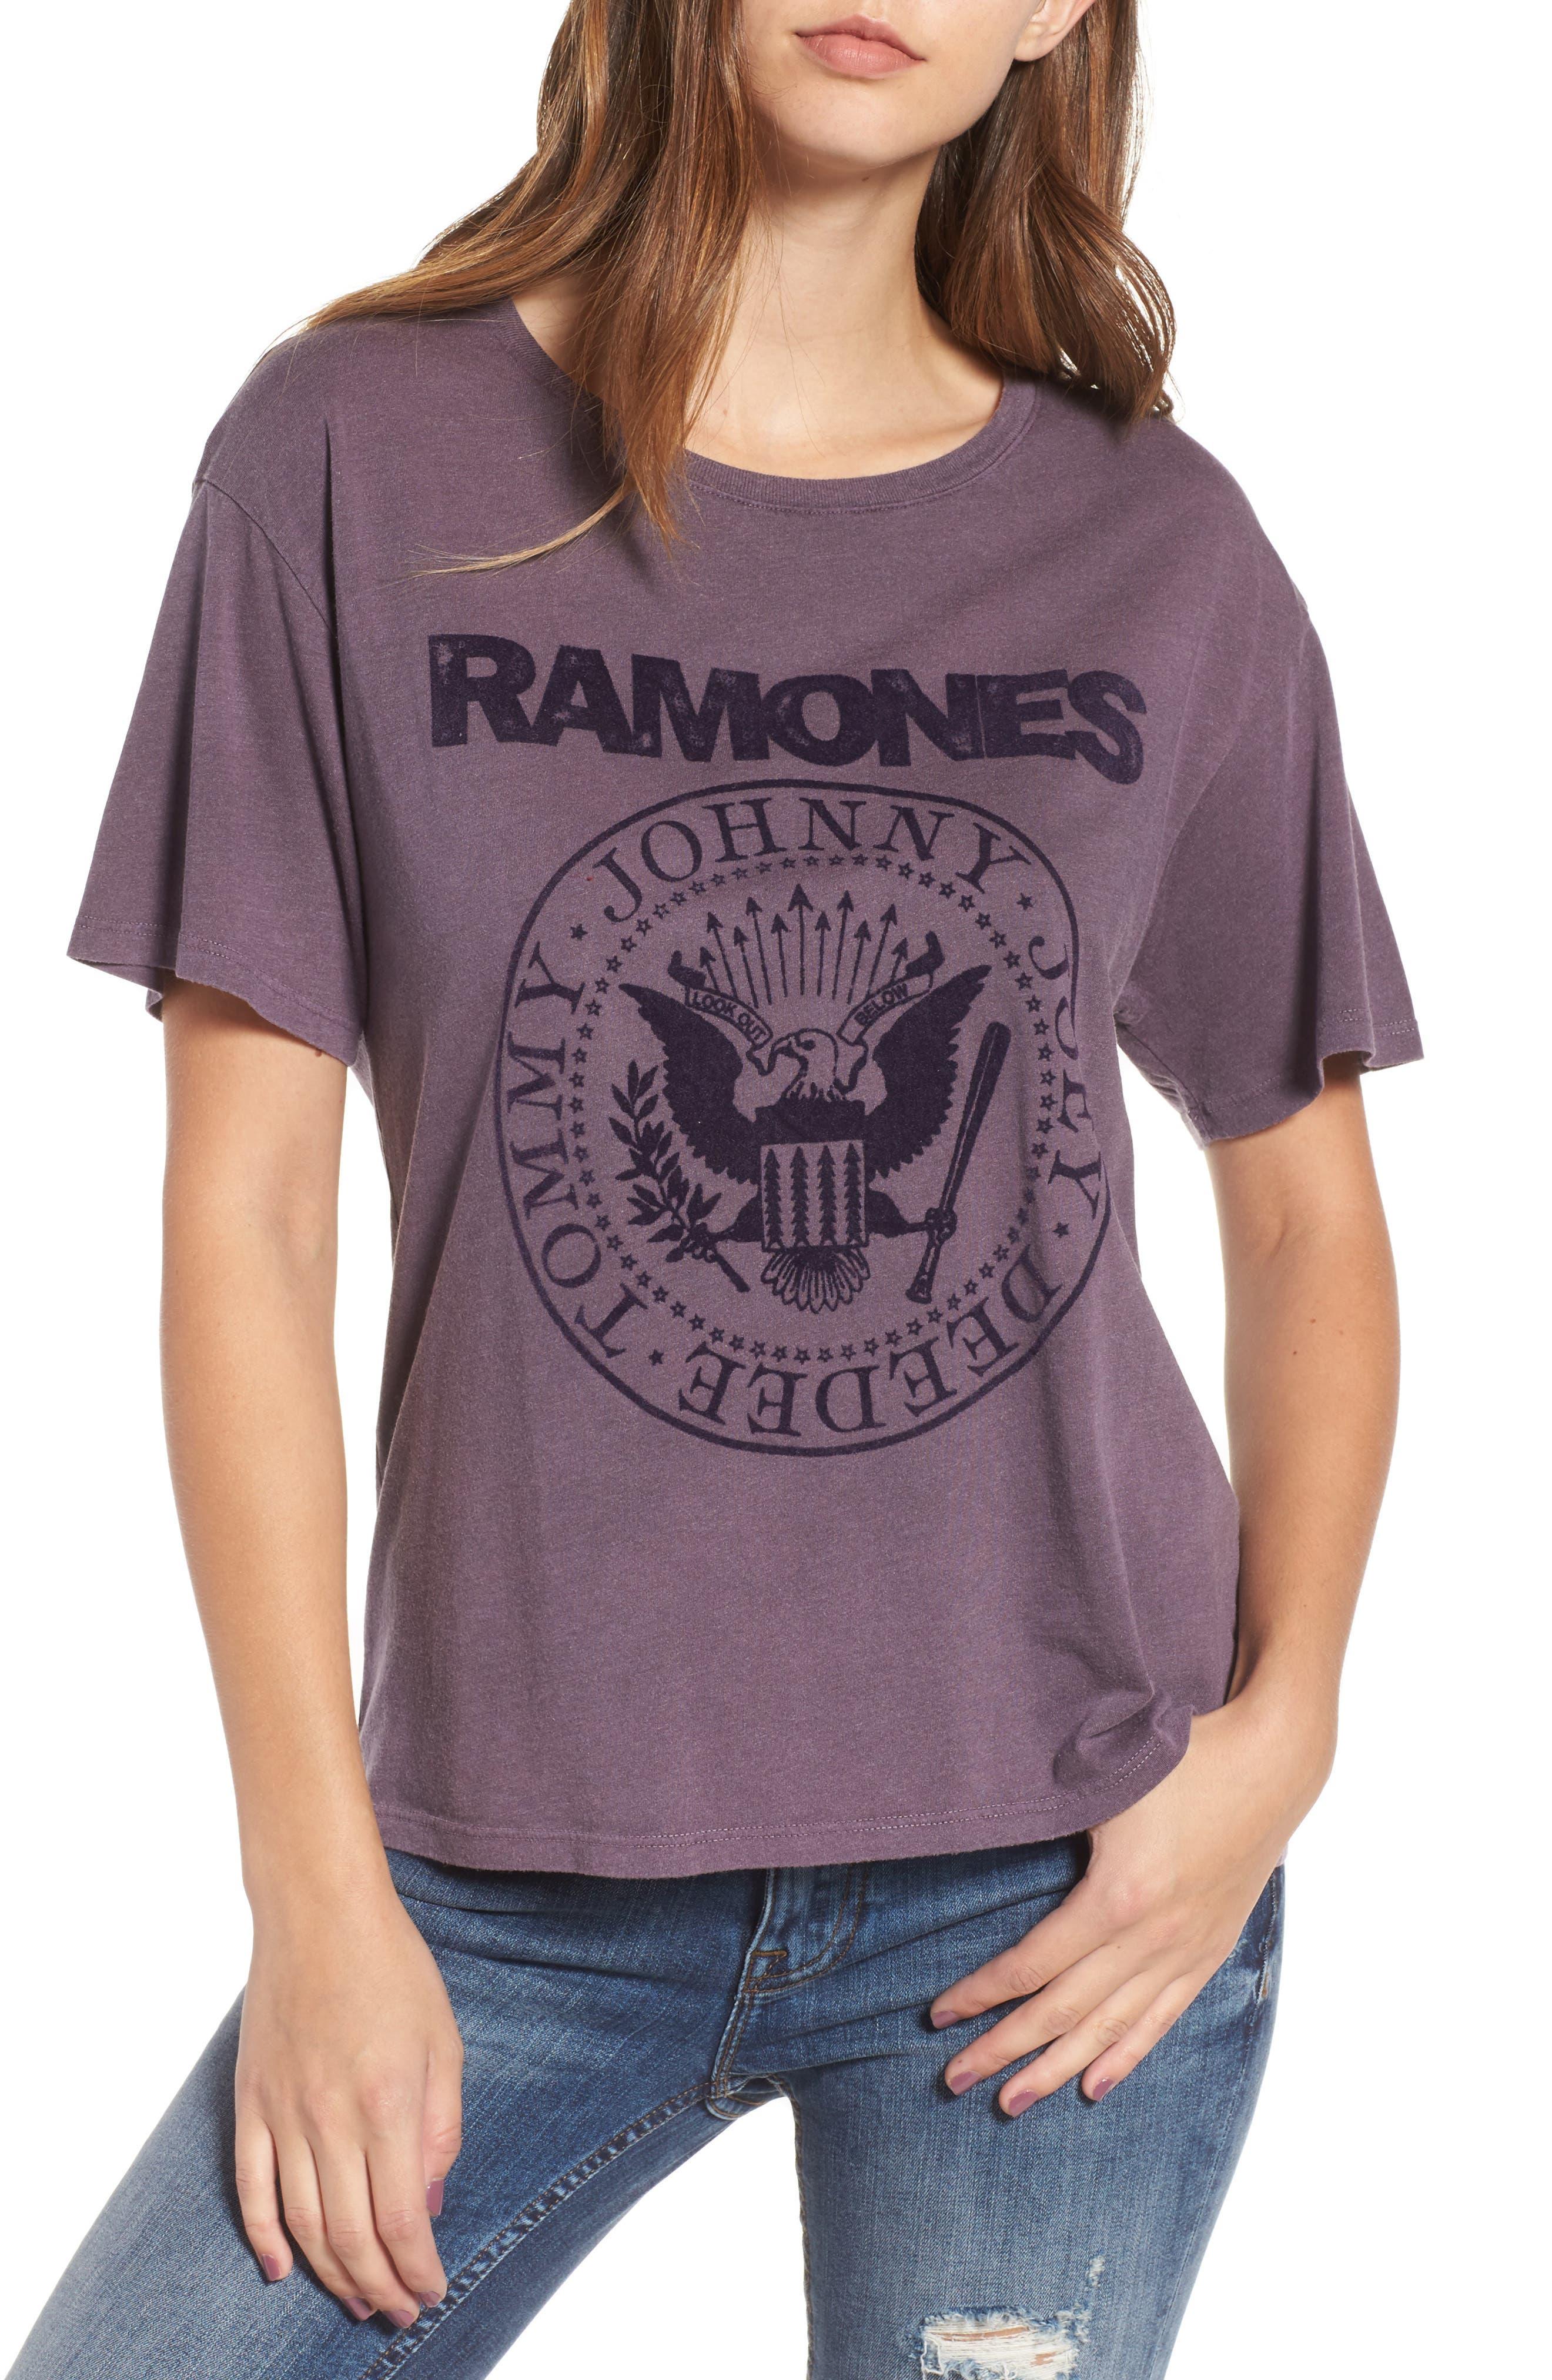 Alternate Image 1 Selected - Daydreamer Ramones Tee